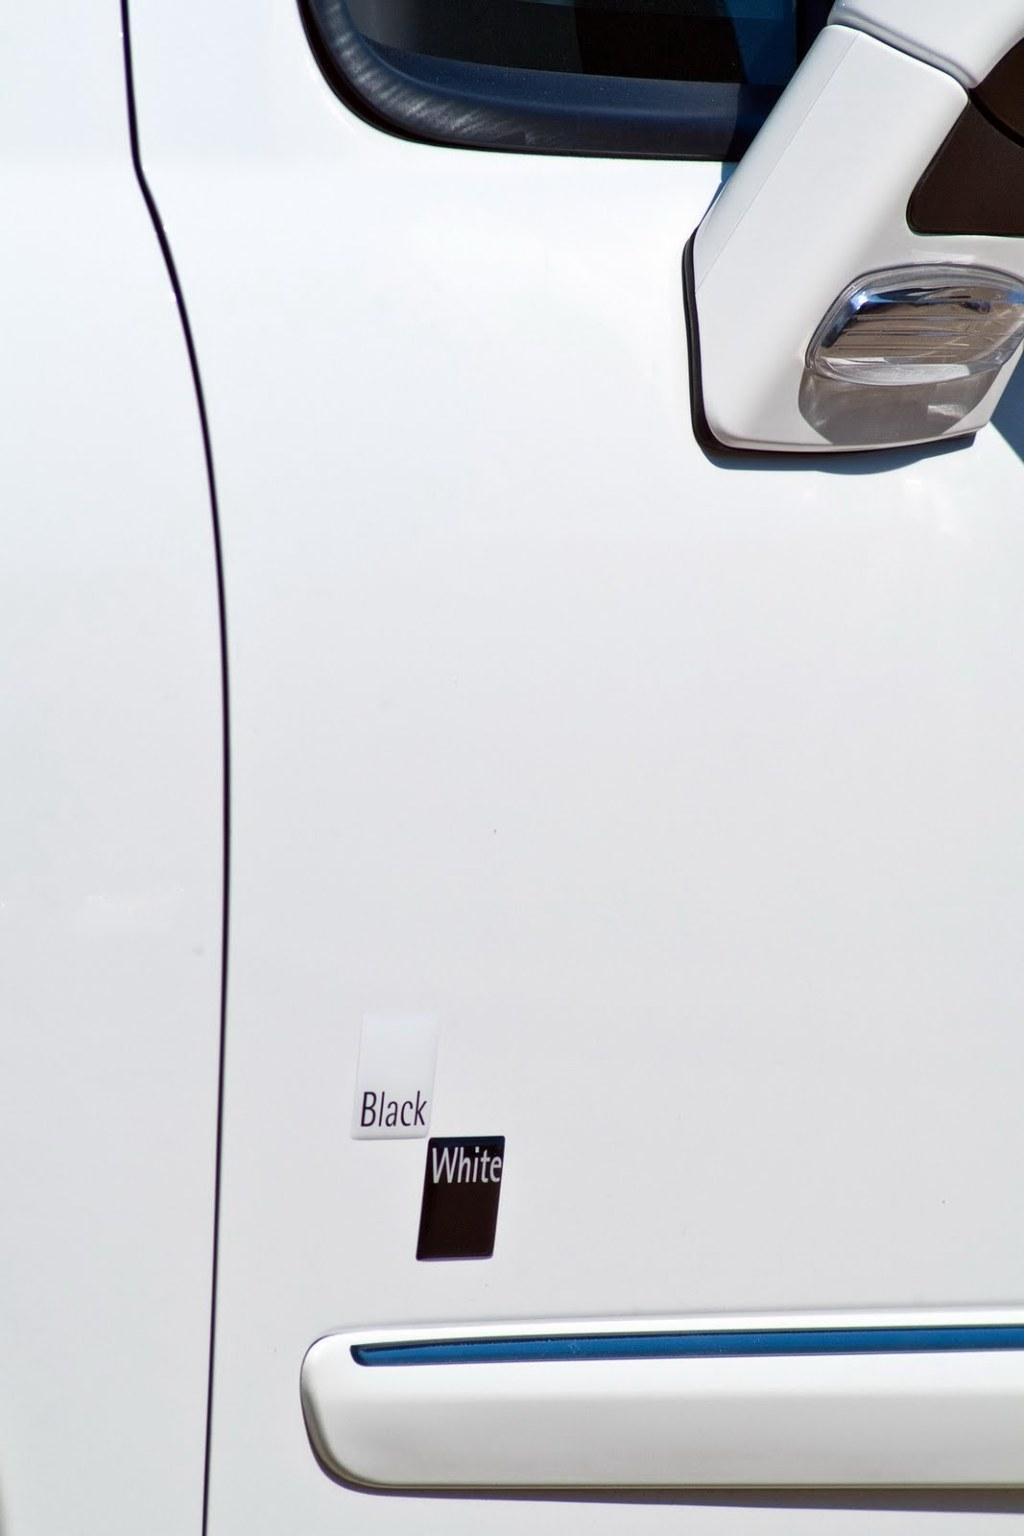 peugeot 207 cc black and white edition mundoautomotor. Black Bedroom Furniture Sets. Home Design Ideas